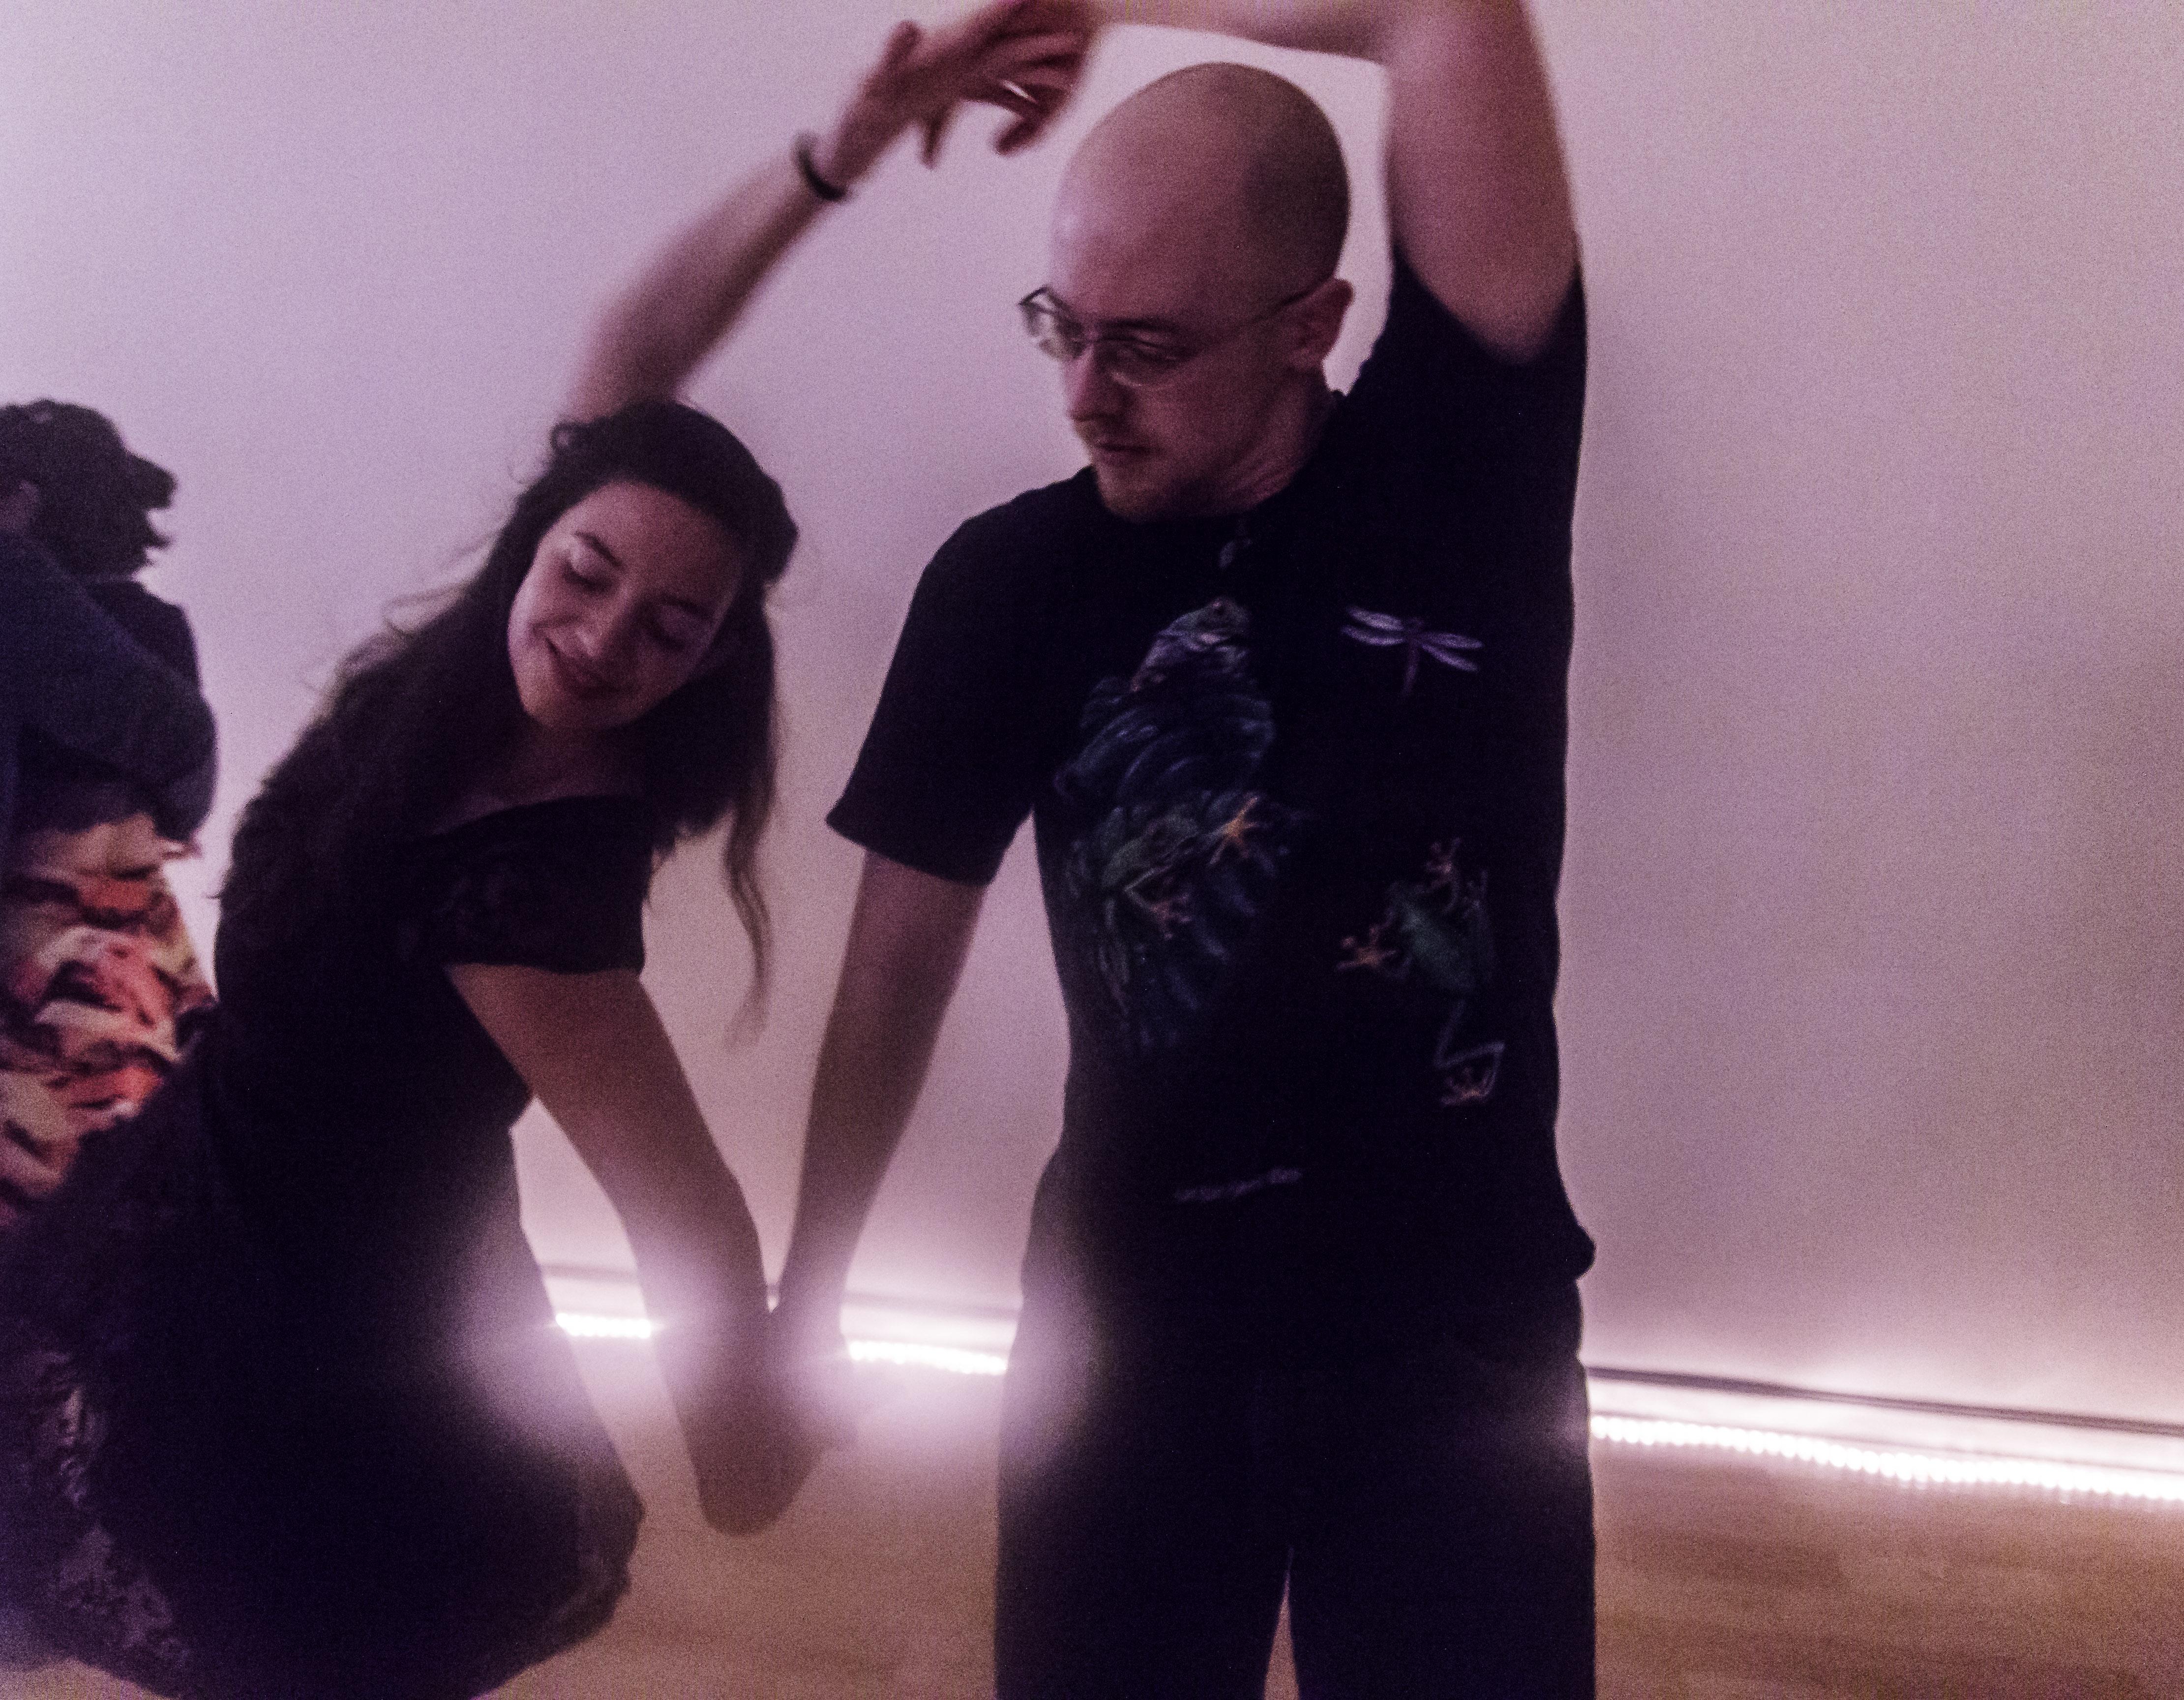 The anatomy of dance- Man and woman dancing - Cleverish Magazine